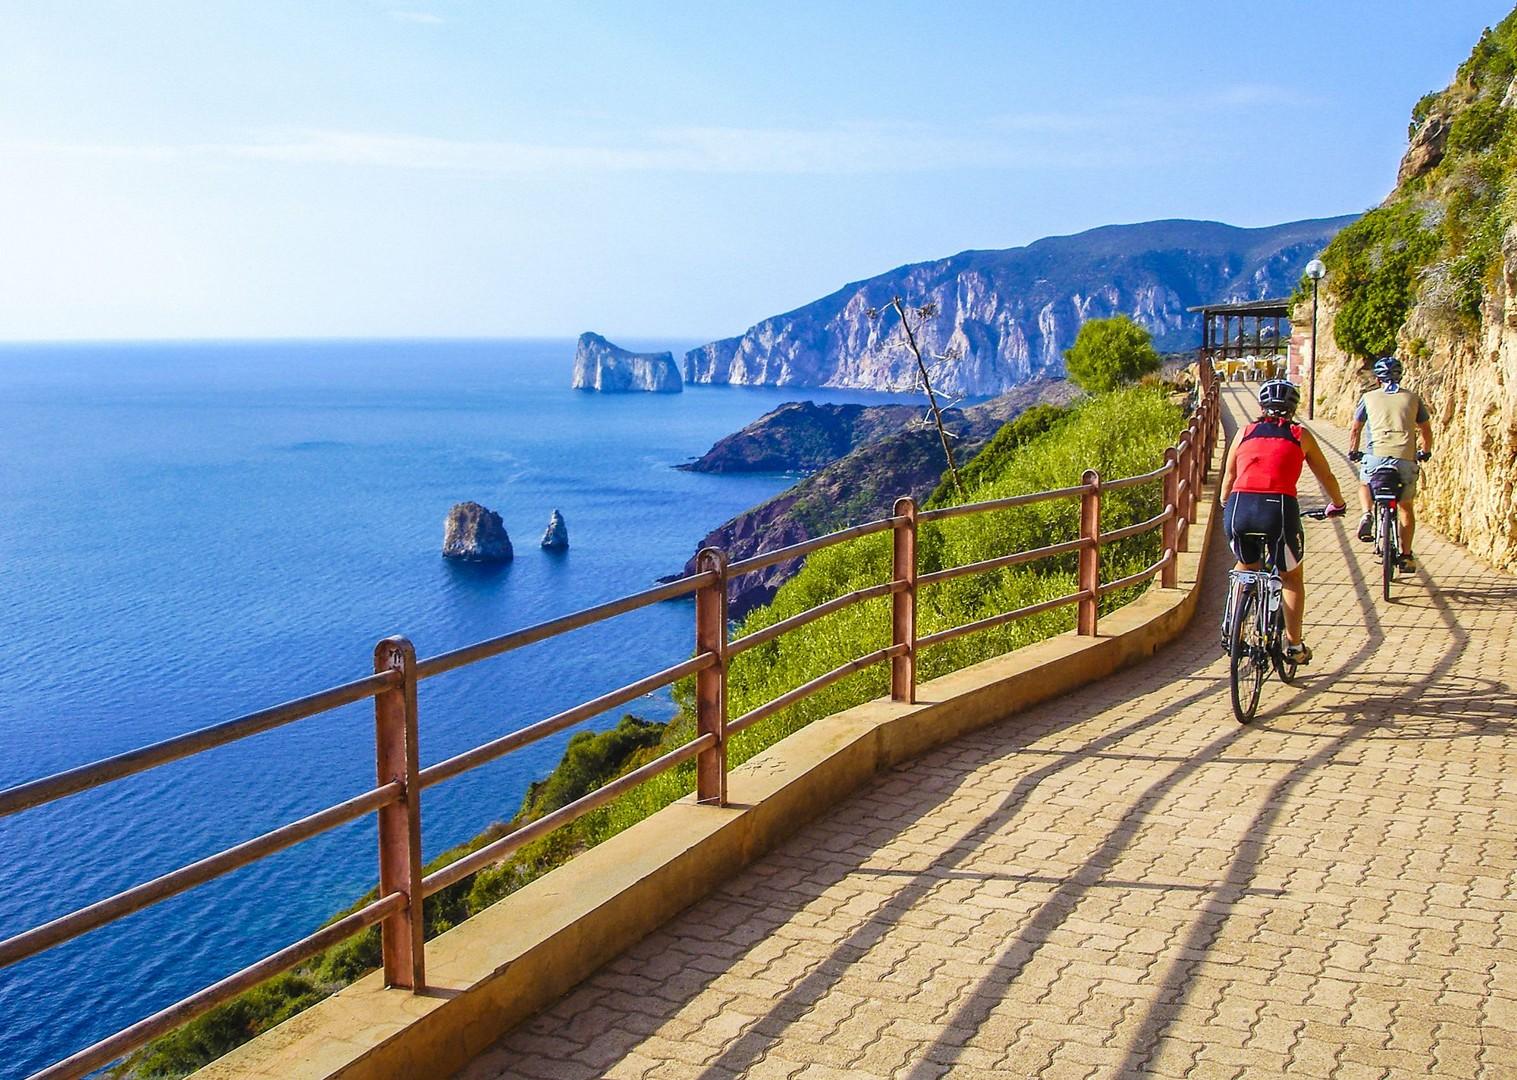 fdfsdfsdfsdfsdfsdf4.jpg - Italy - Sardinia - Island Flavours - Guided Leisure Cycling Holiday - Leisure Cycling